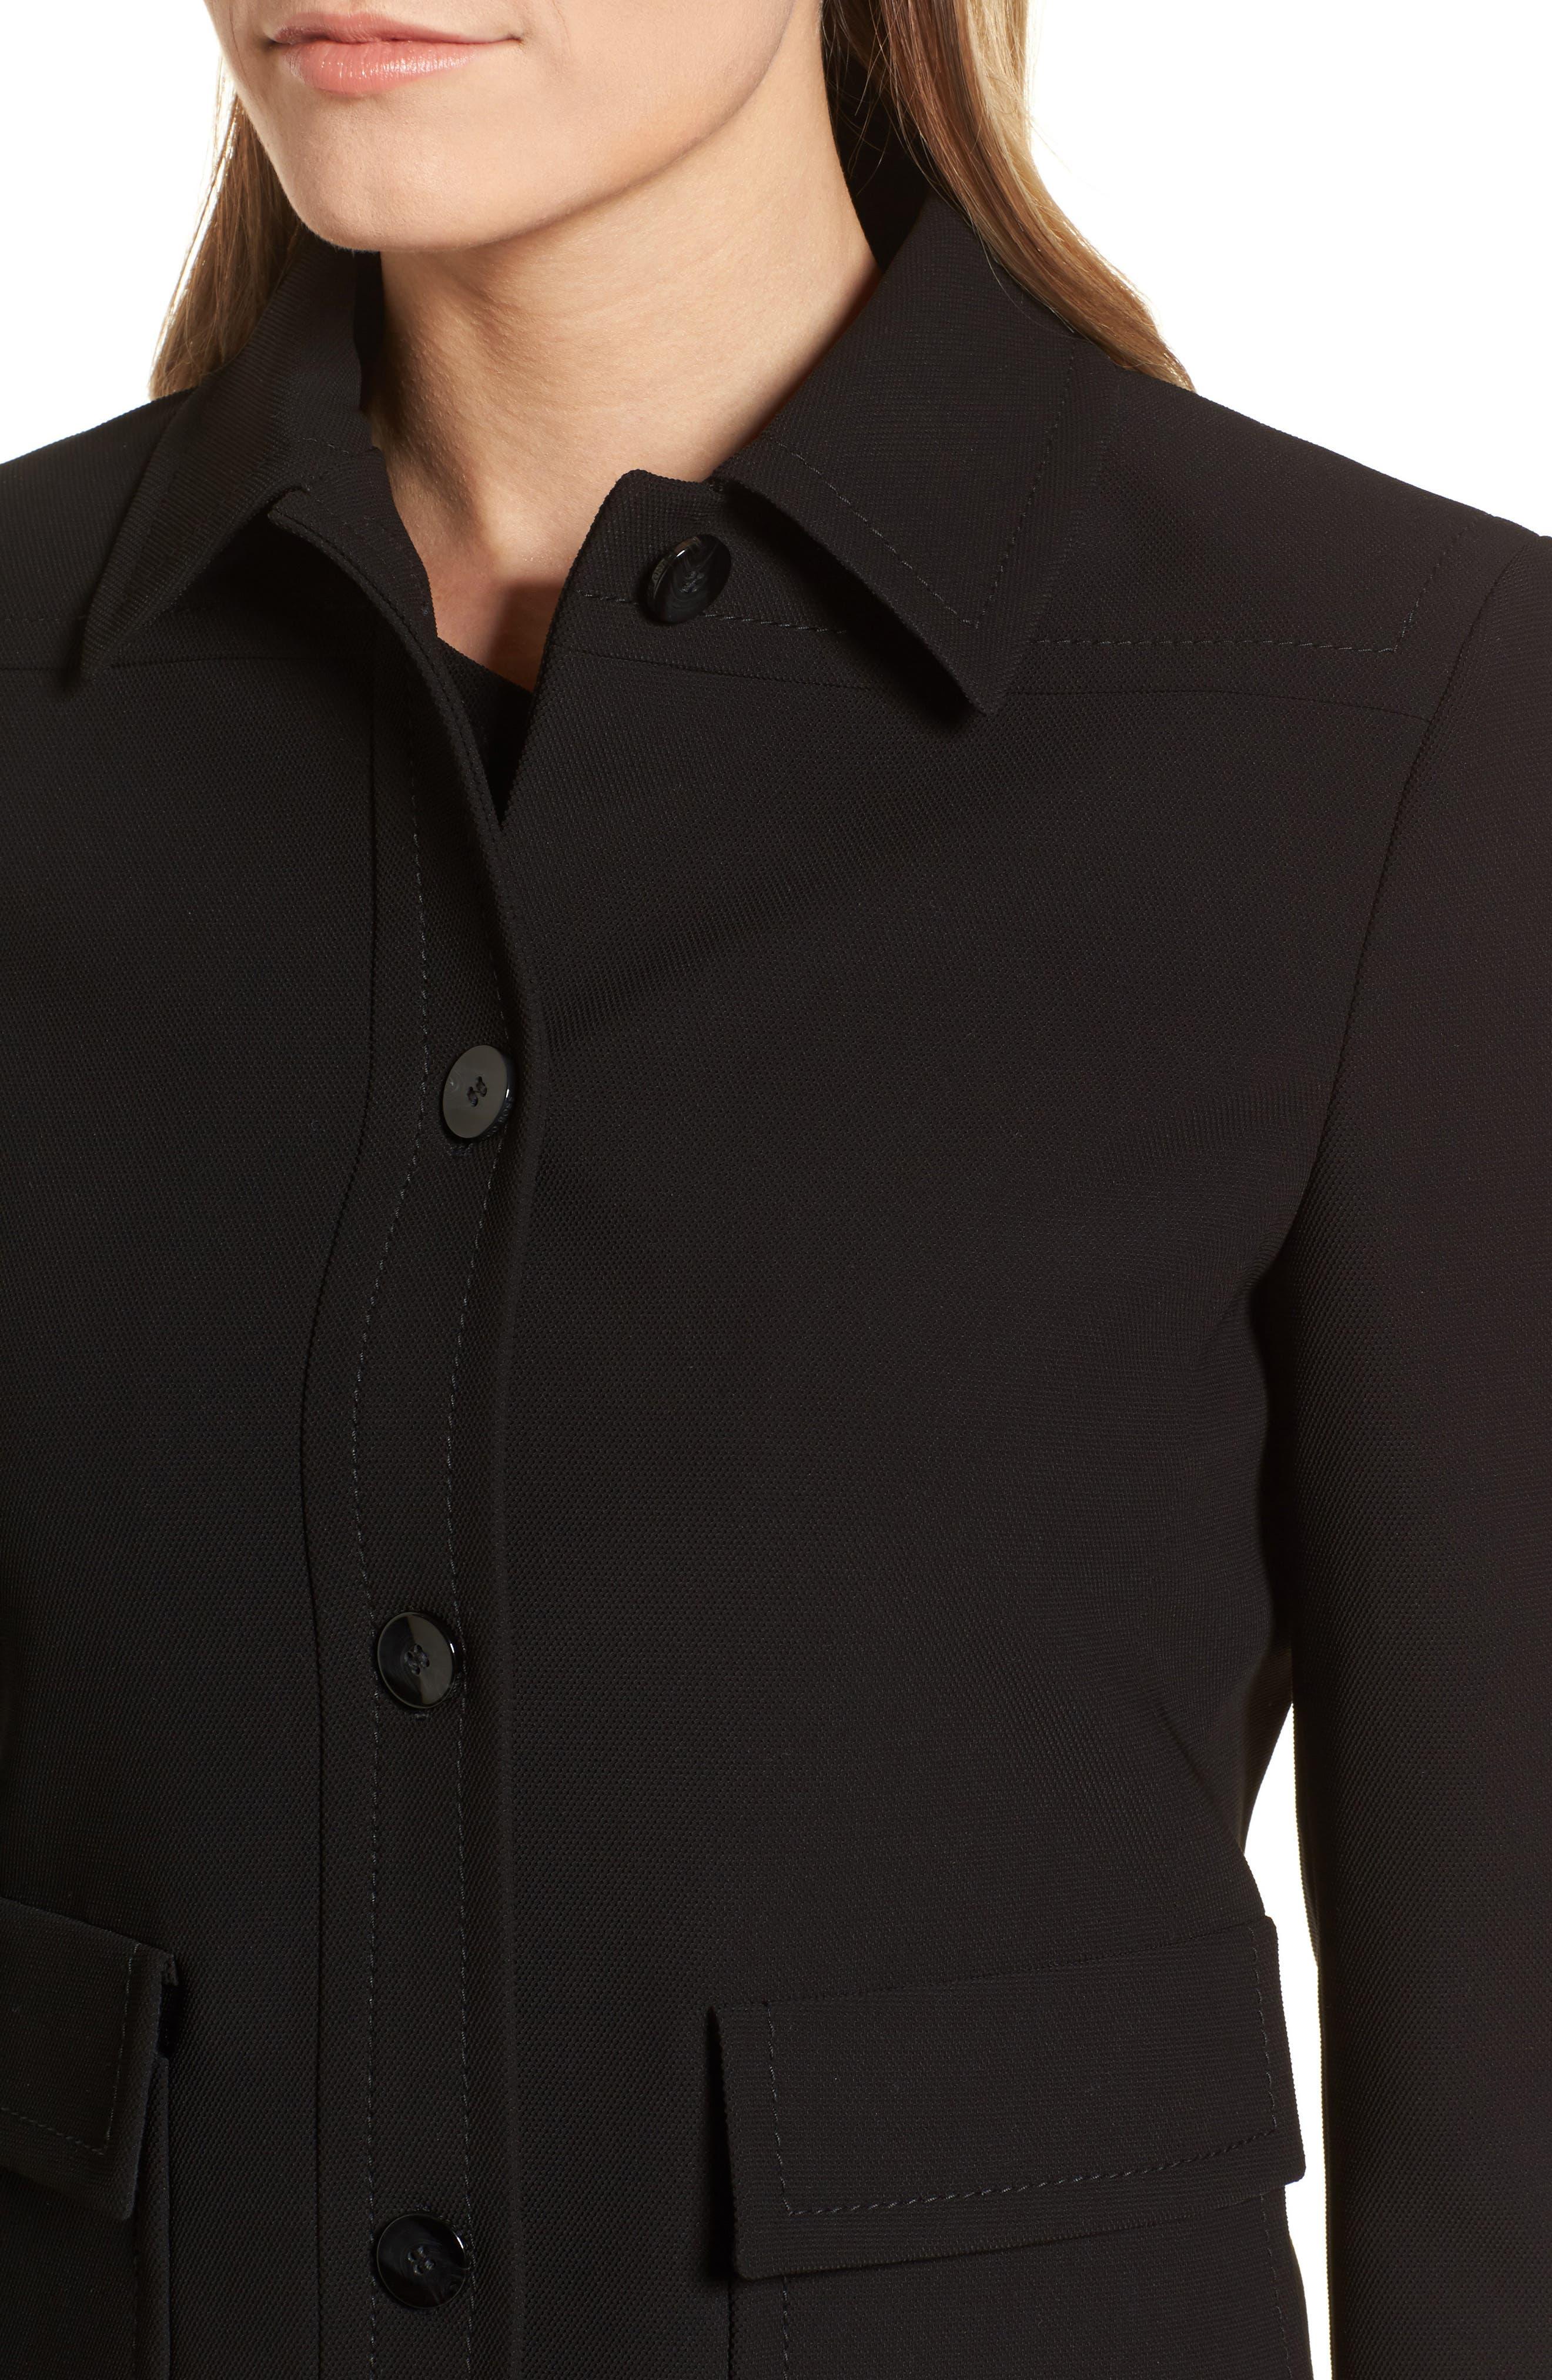 Juriona Crop Jacket,                             Alternate thumbnail 4, color,                             Black